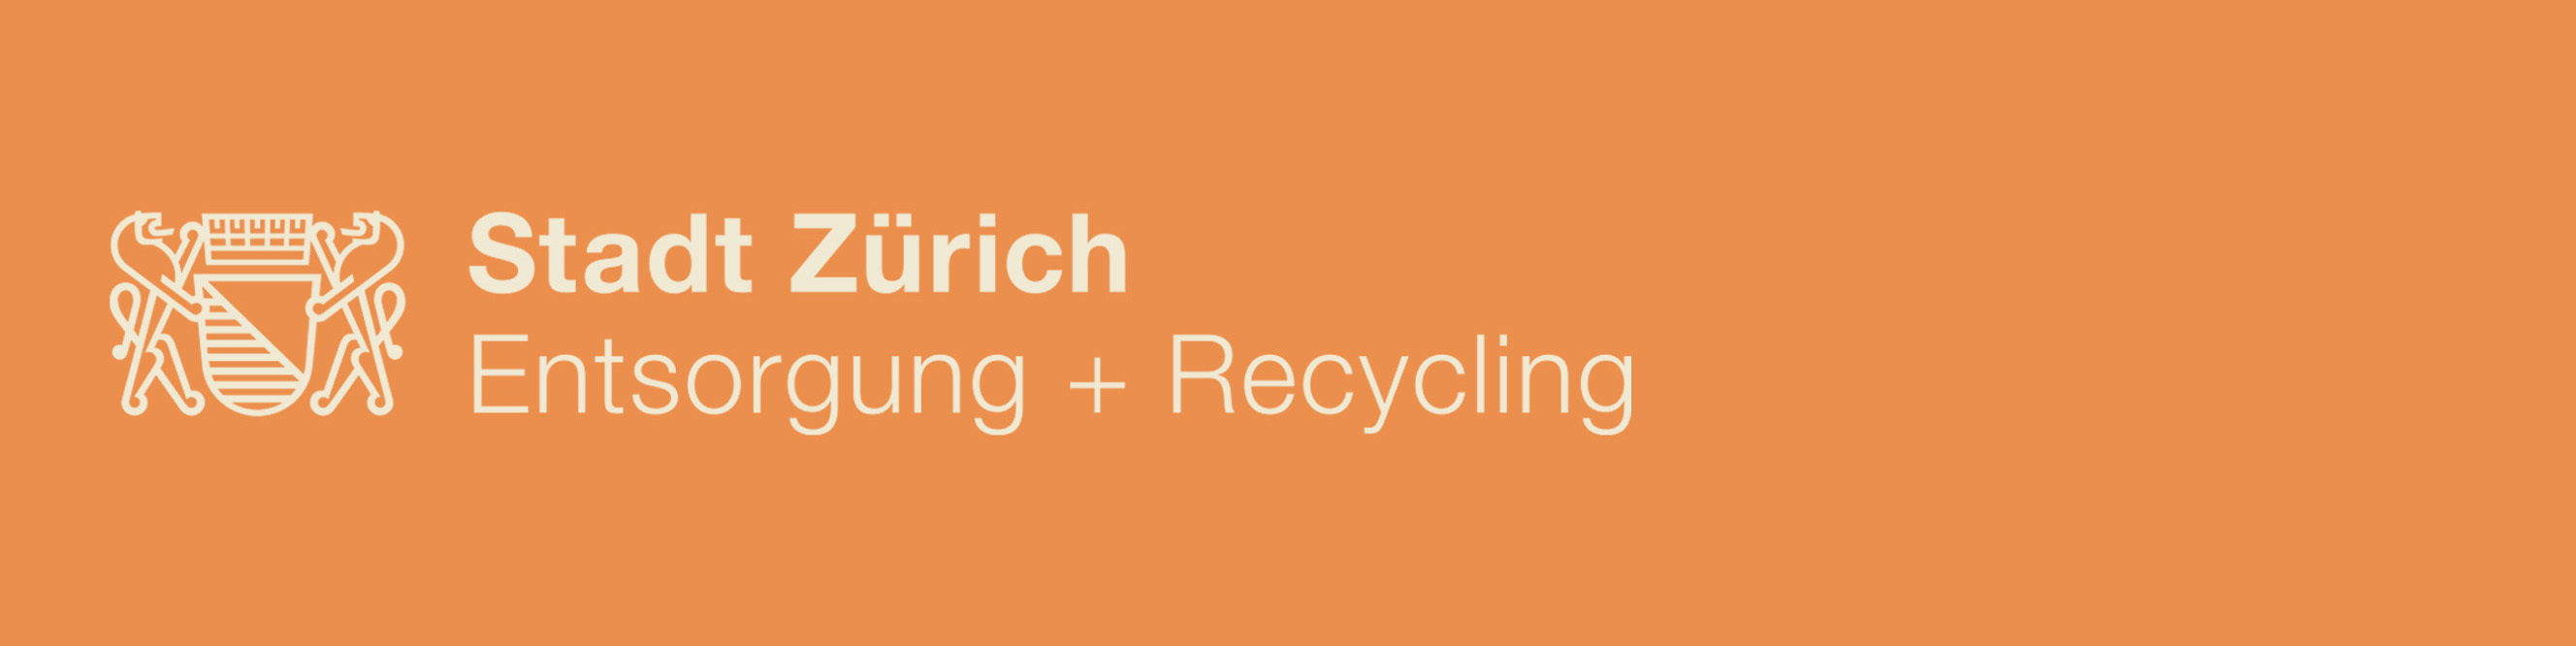 ERZ (Entsorgung + Recycling Zürich)